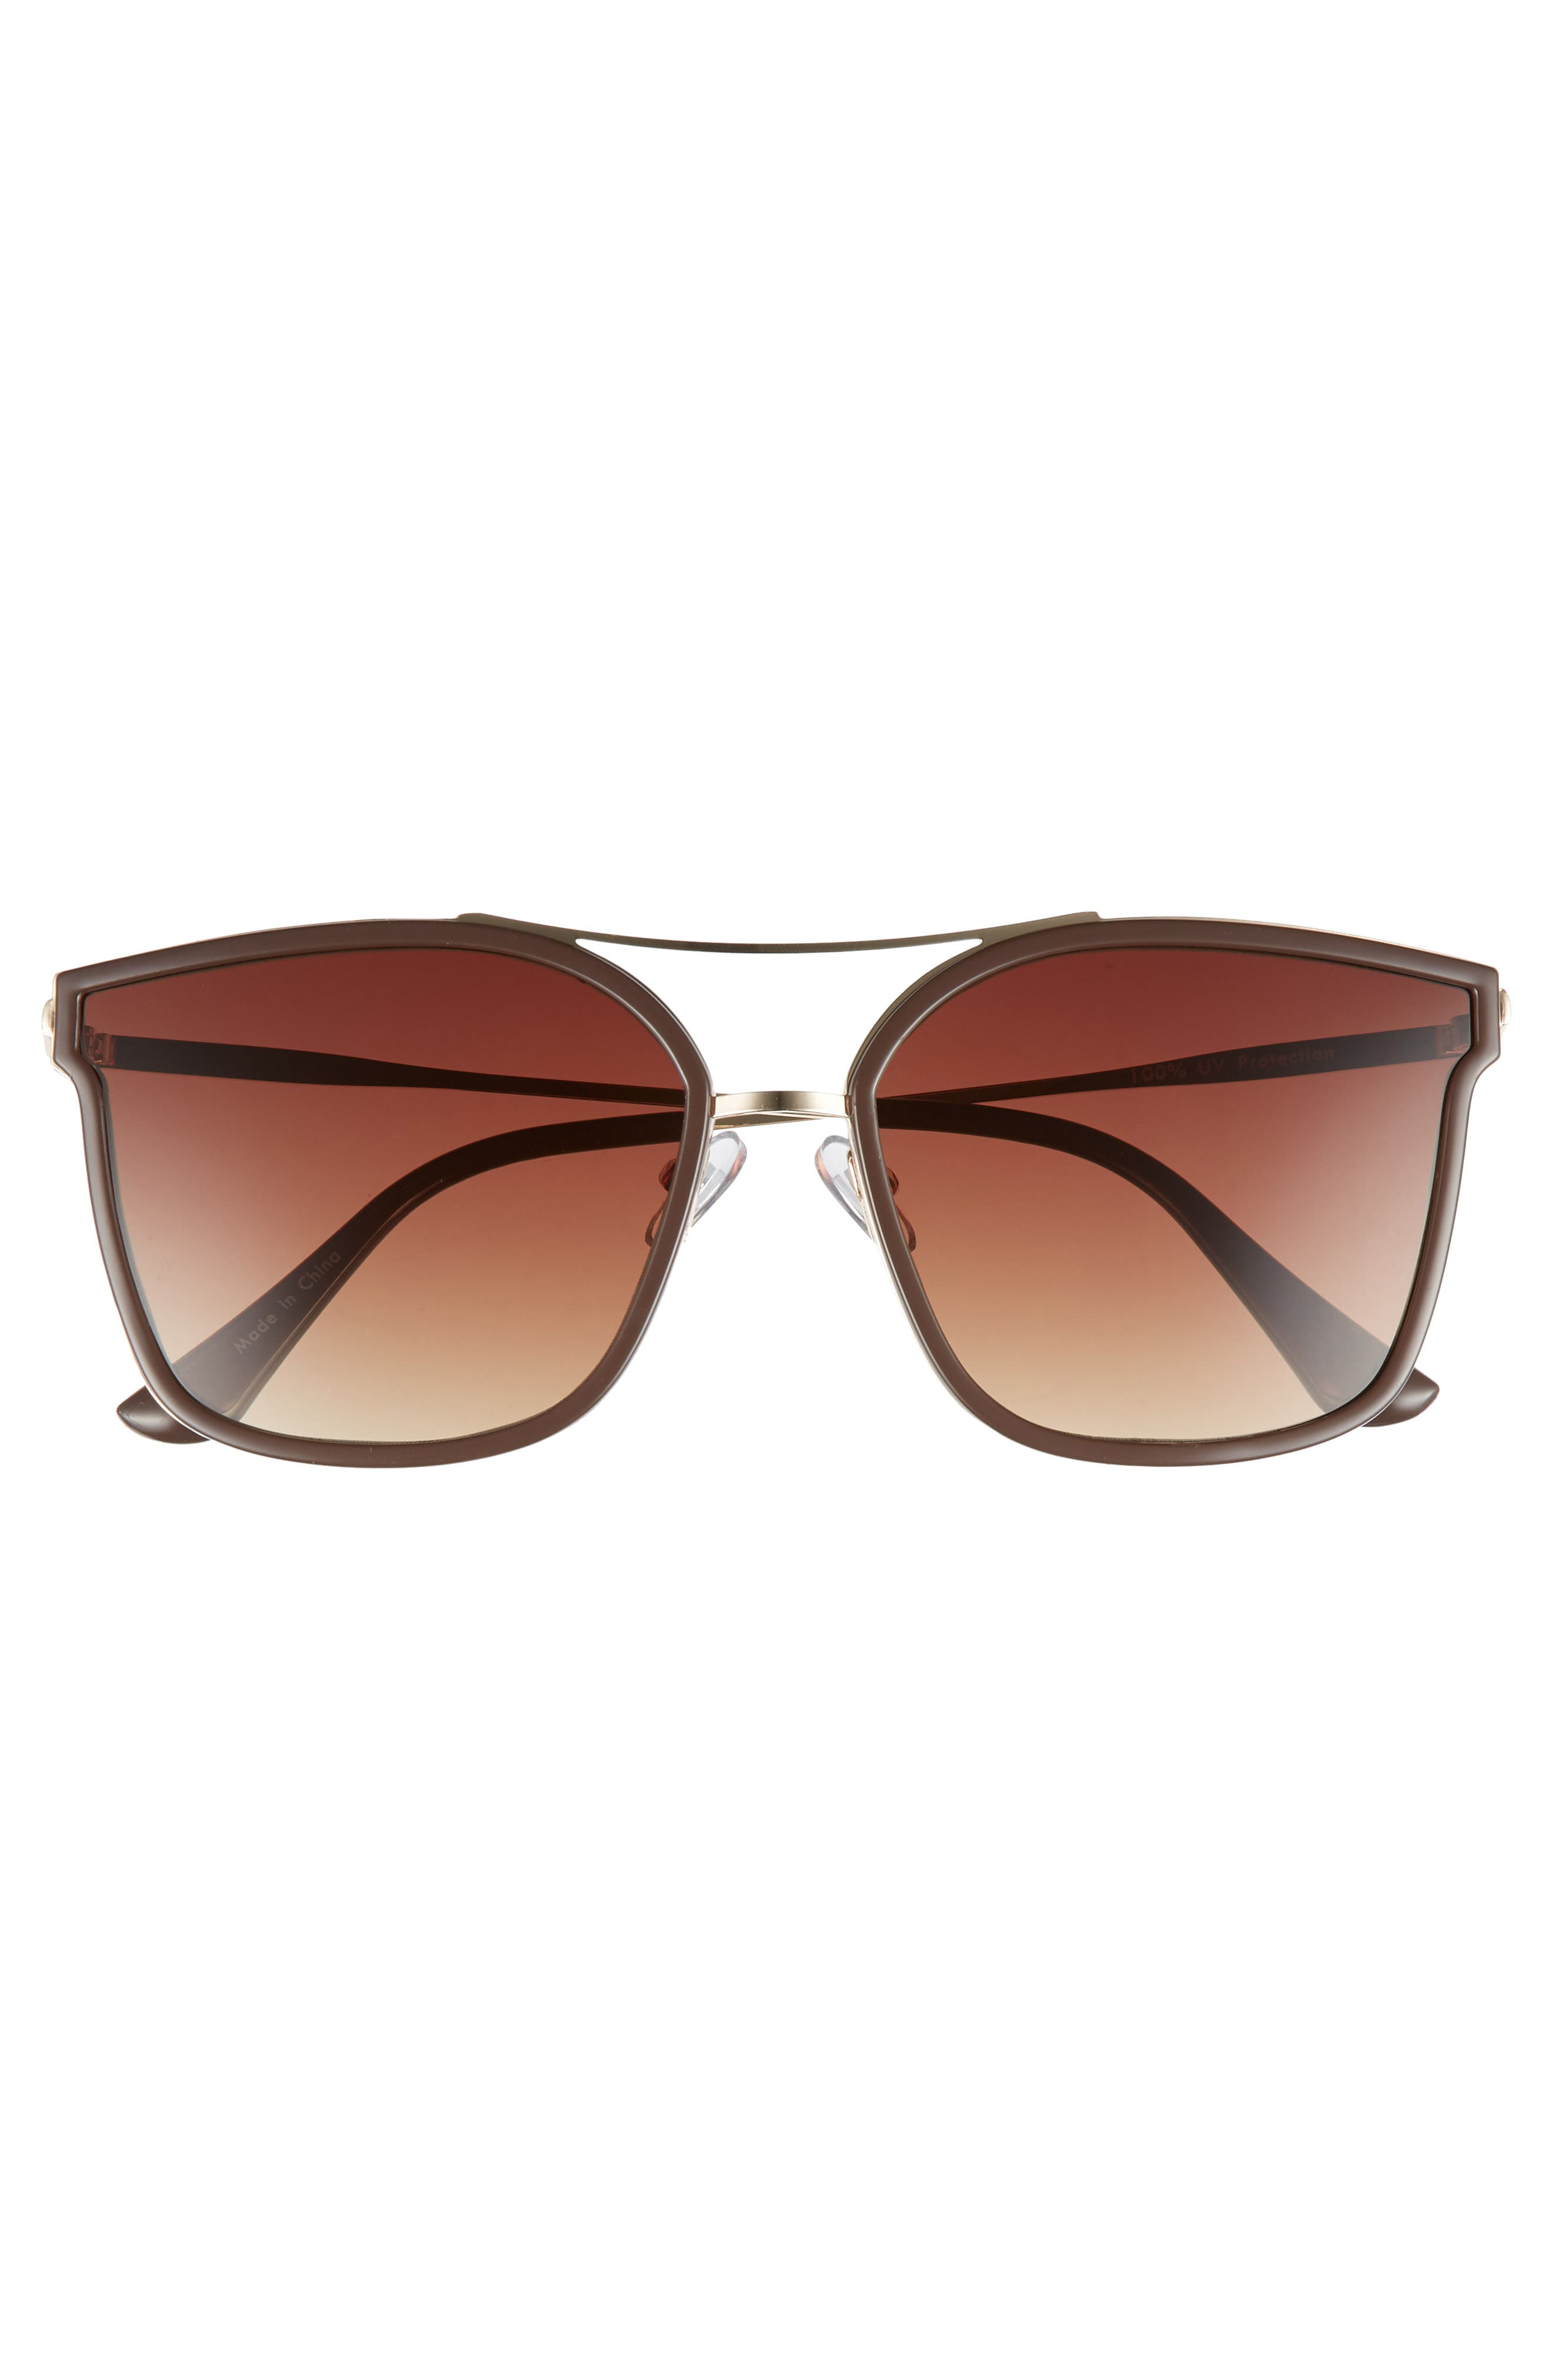 60mm Cat Eye Sunglasses,                             Alternate thumbnail 3, color,                             710